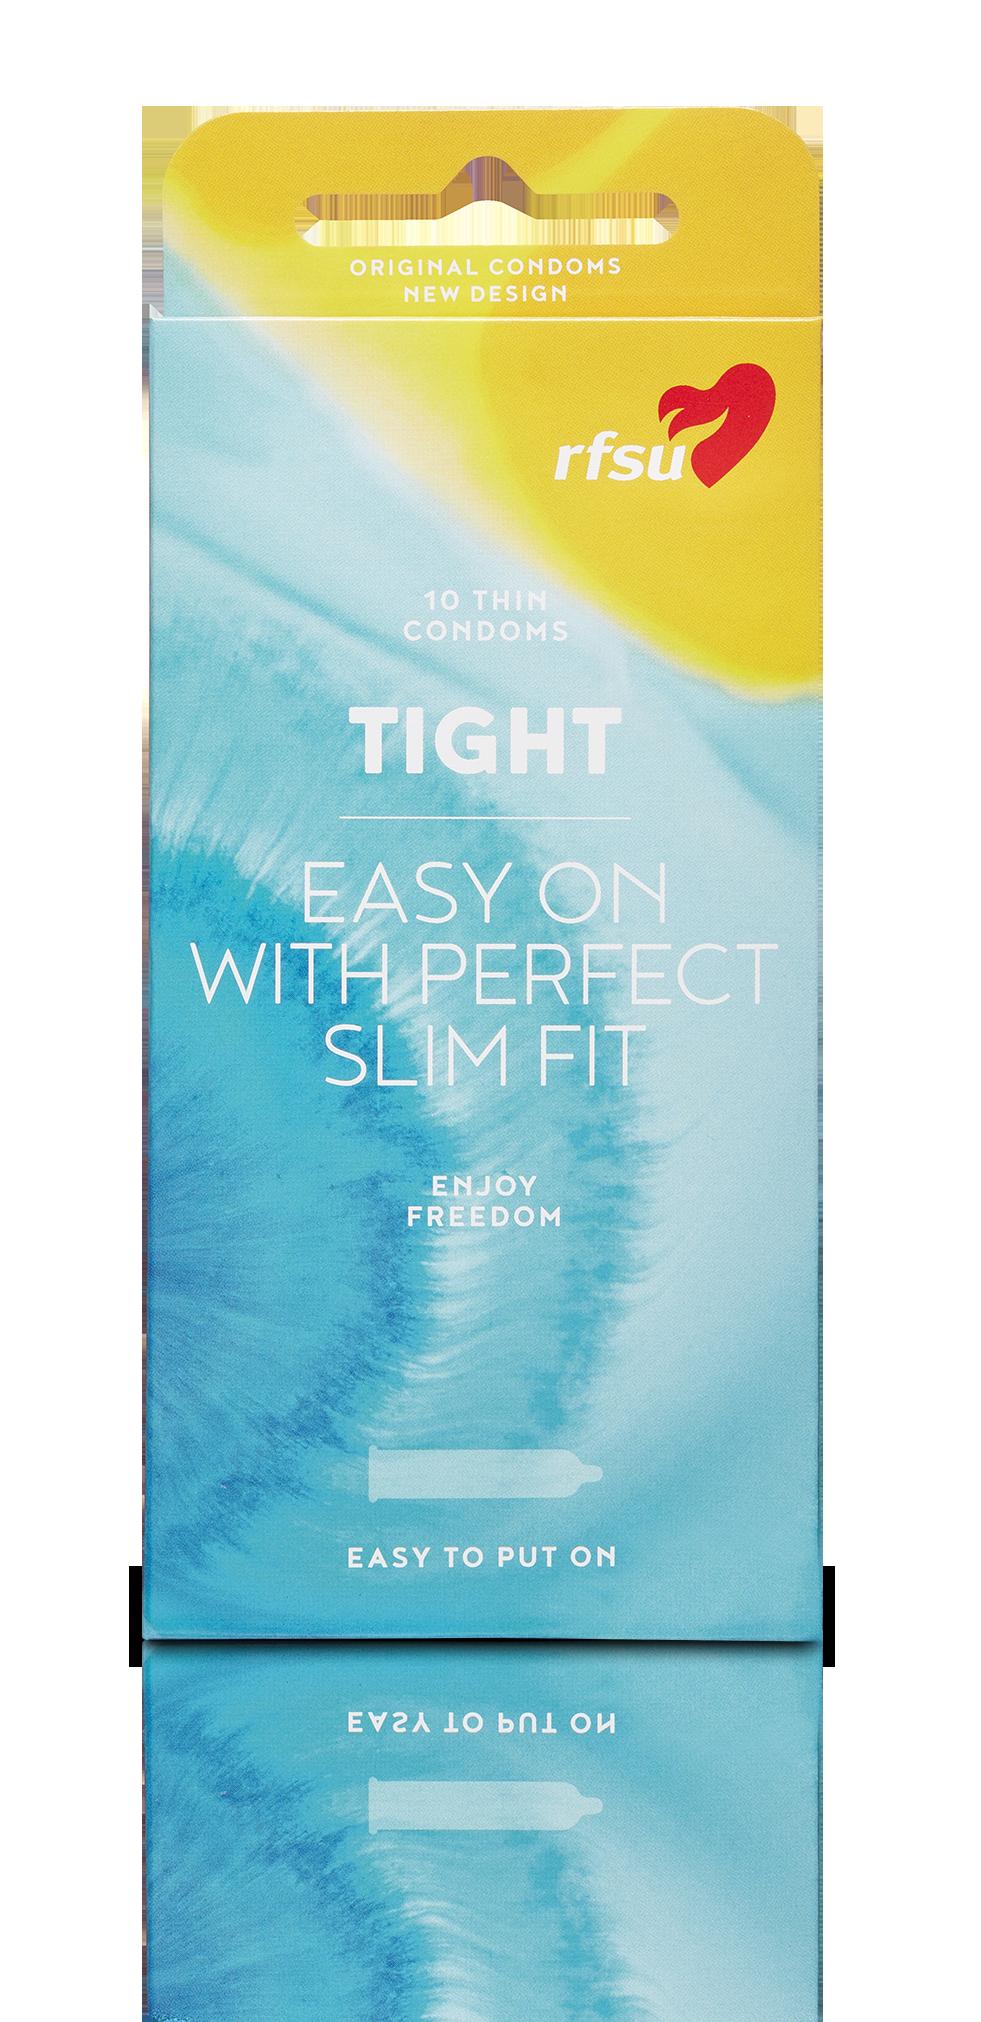 TIGHT | Thin Condoms